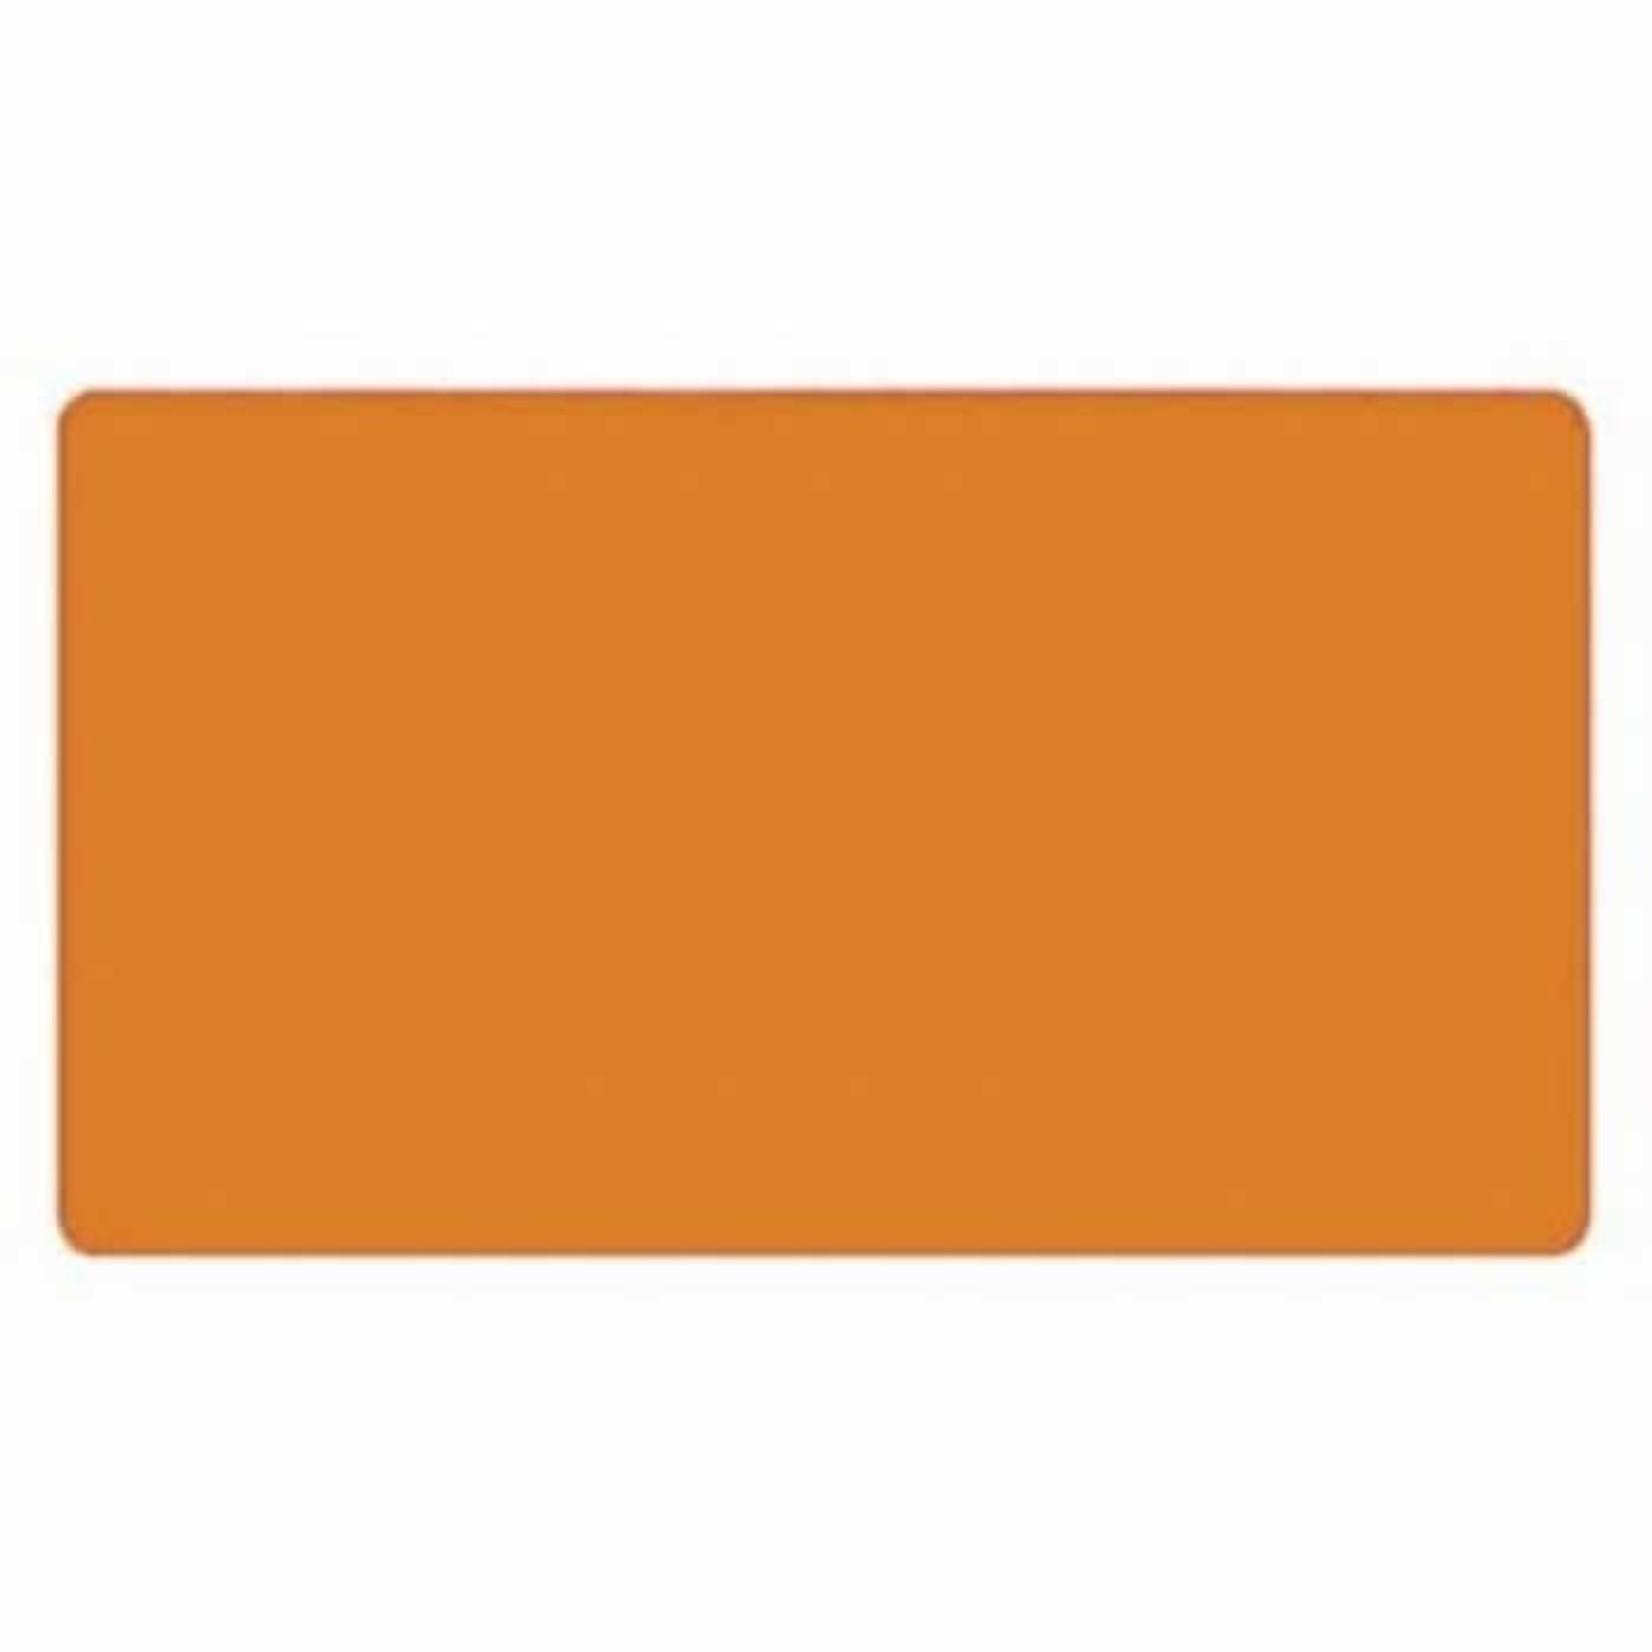 Orange Playmat nested egg